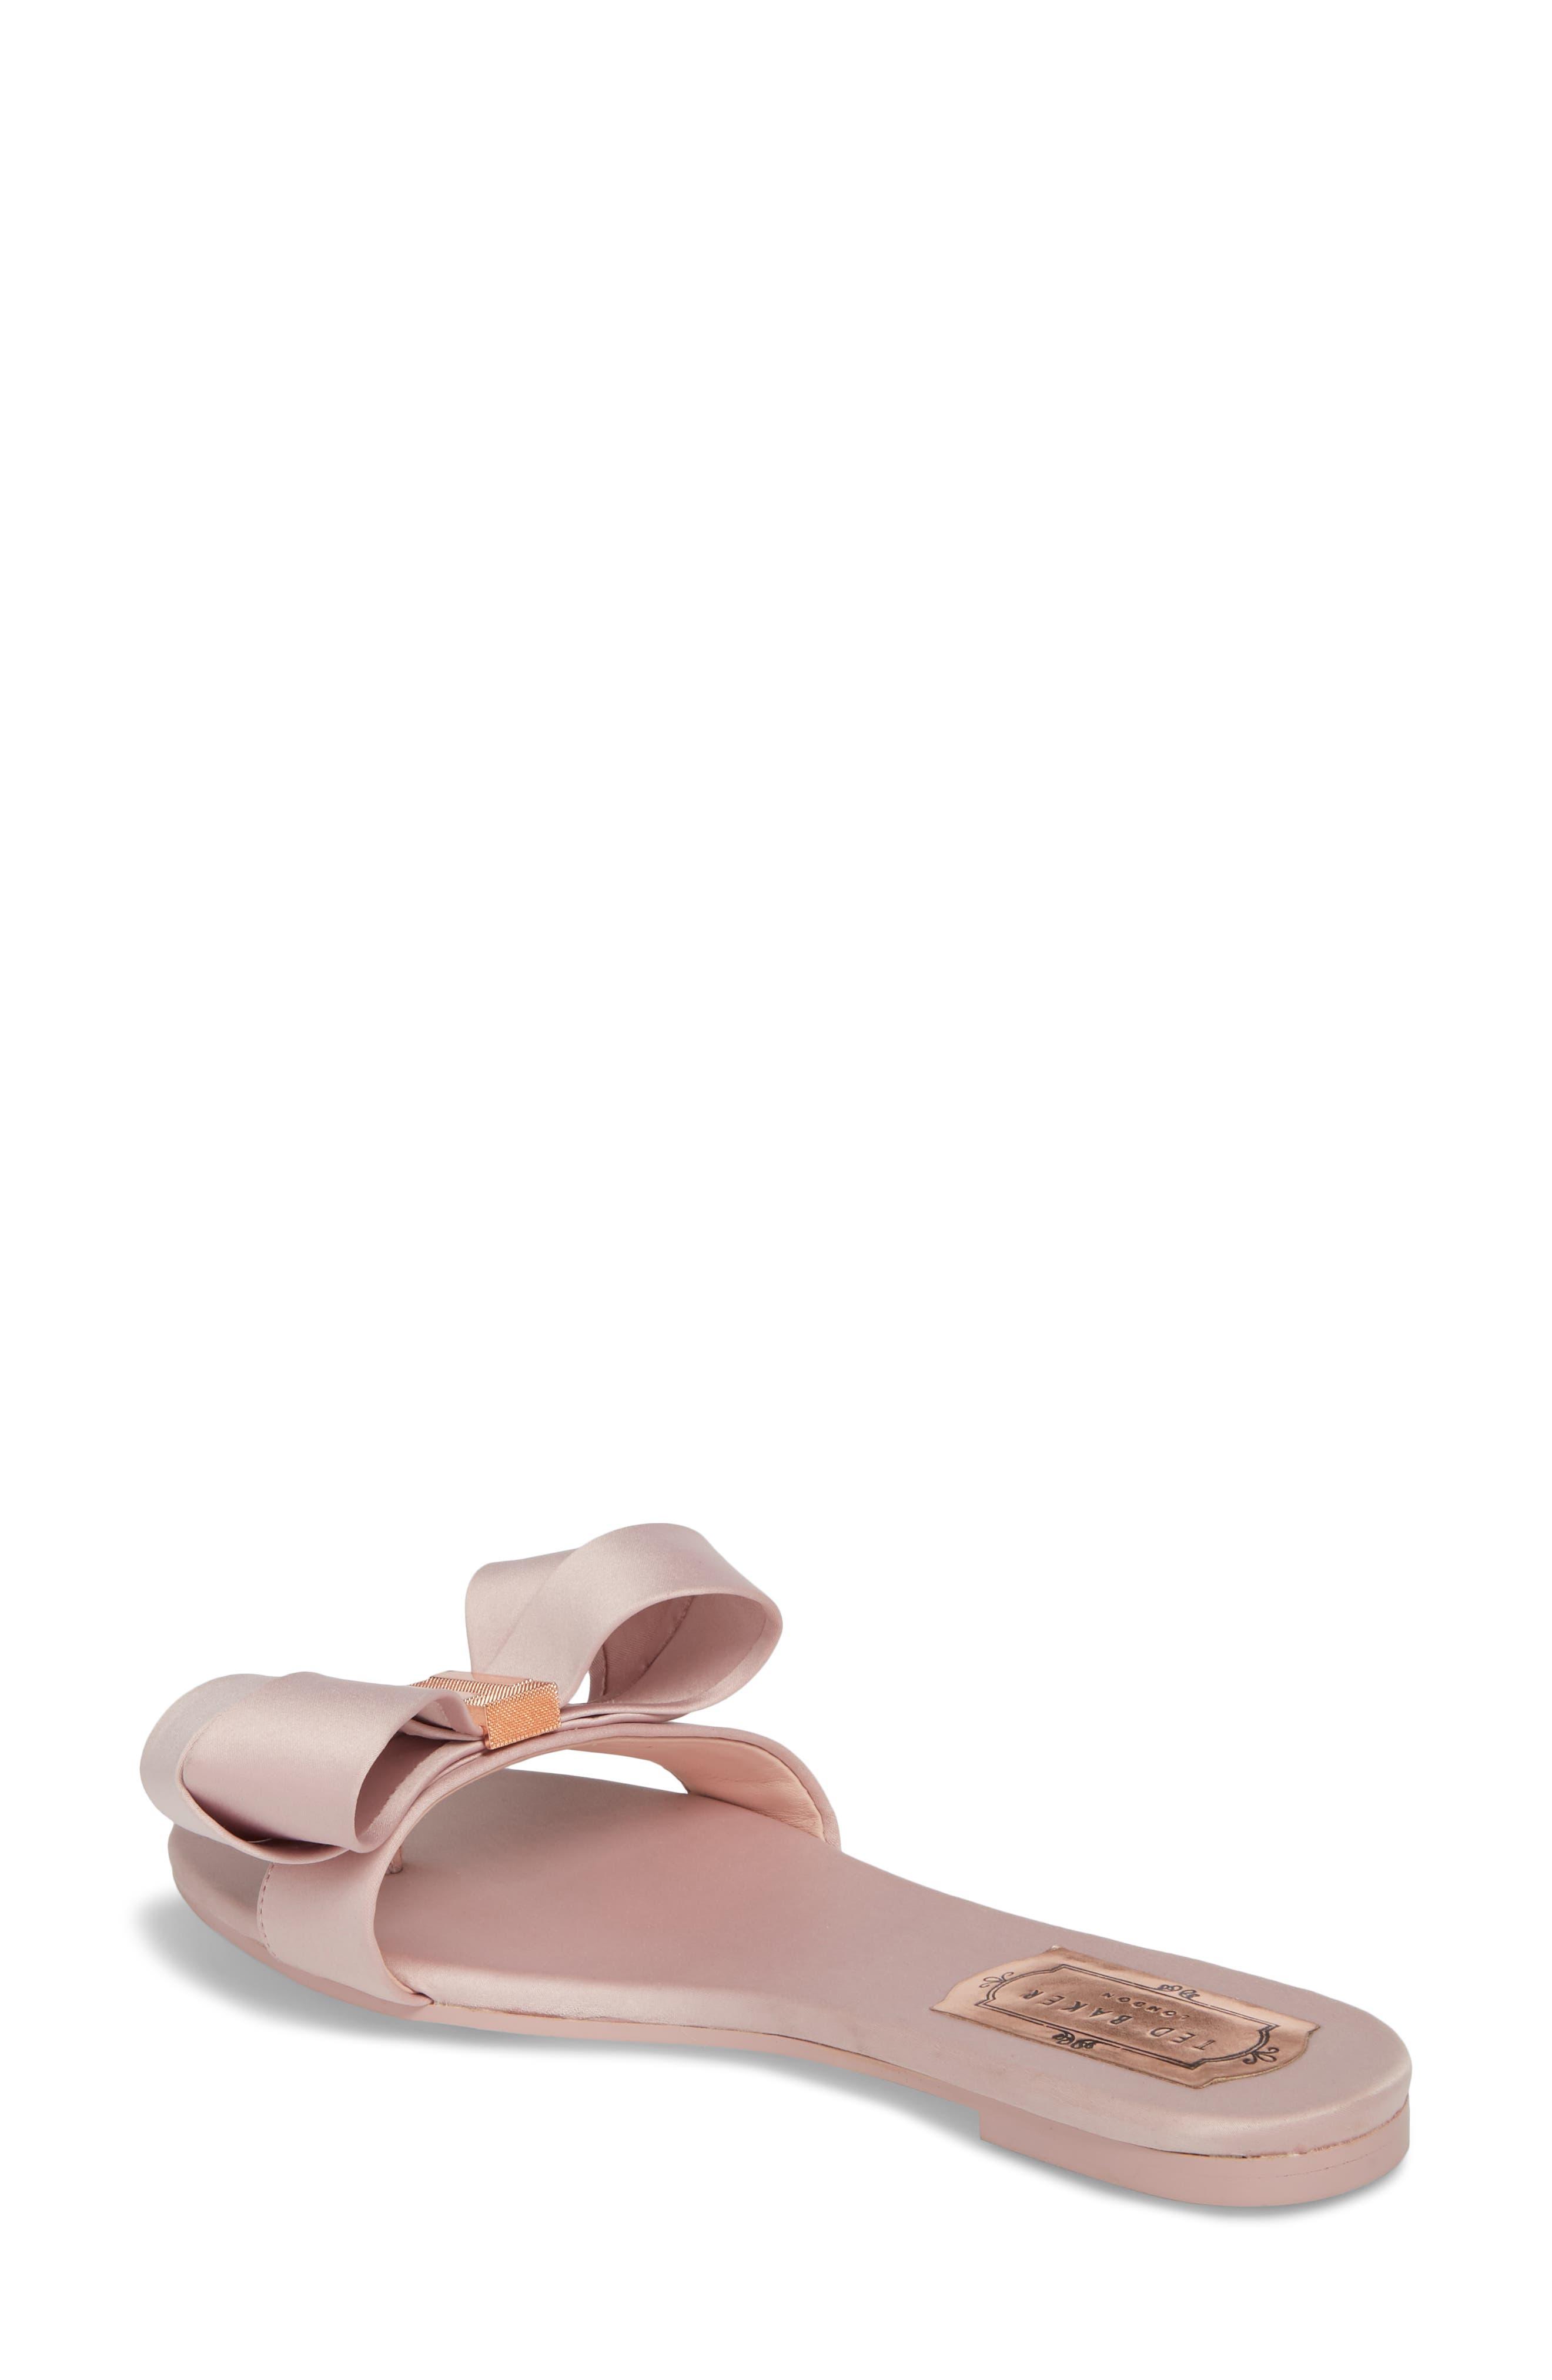 Ted BakerBEAUITA - T-bar sandals - light grey hRh6AQZ8mT